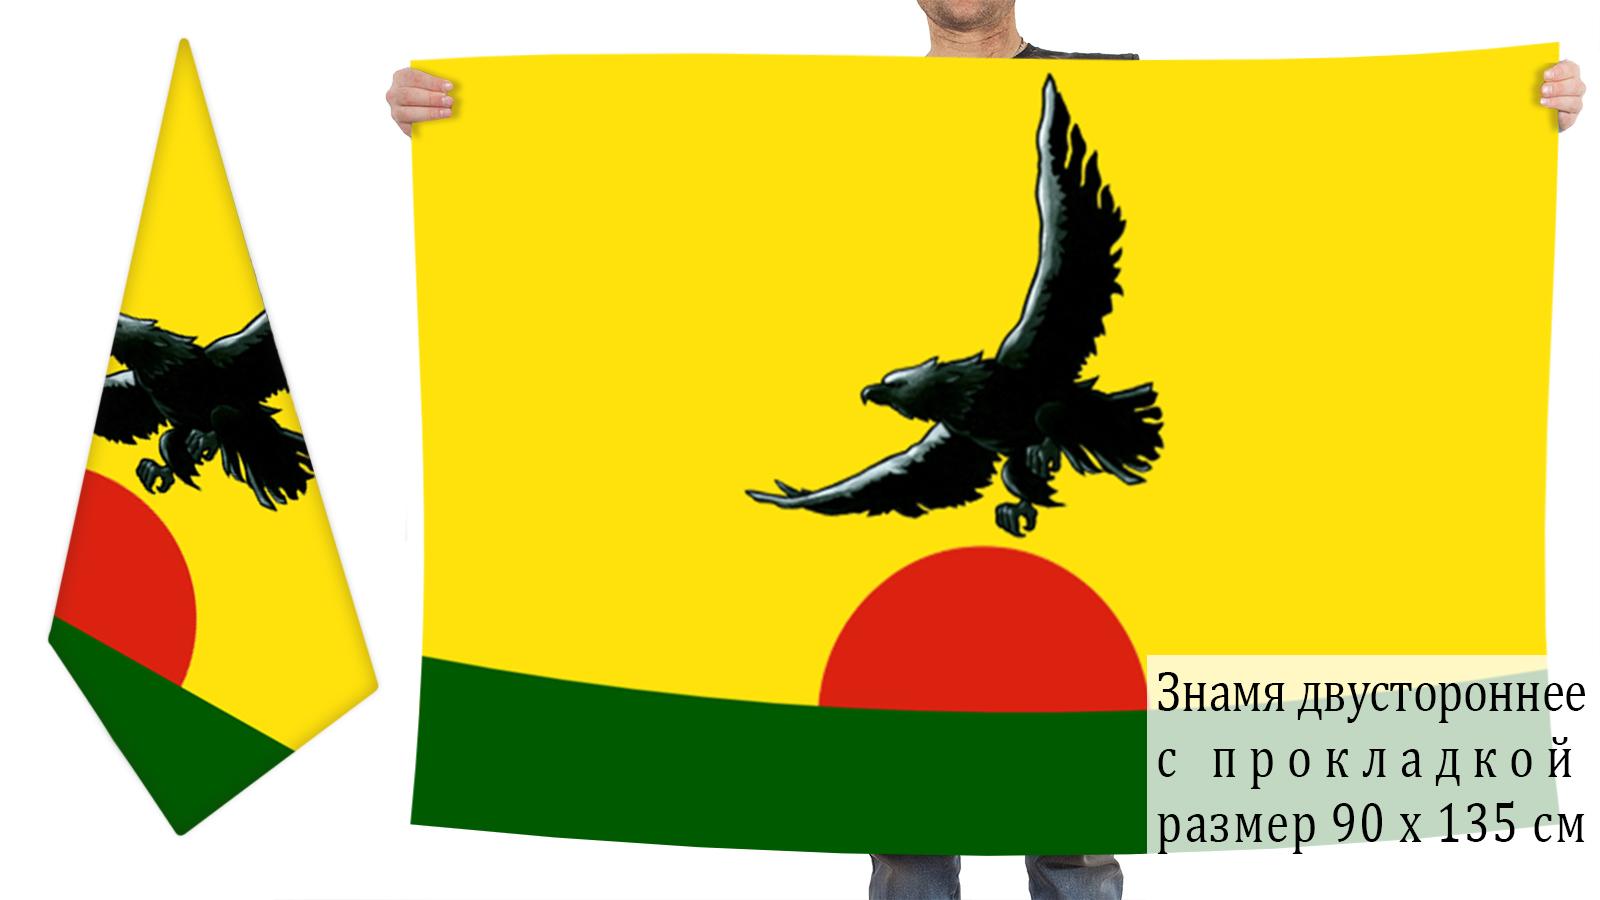 Двусторонний флаг Радищевского района